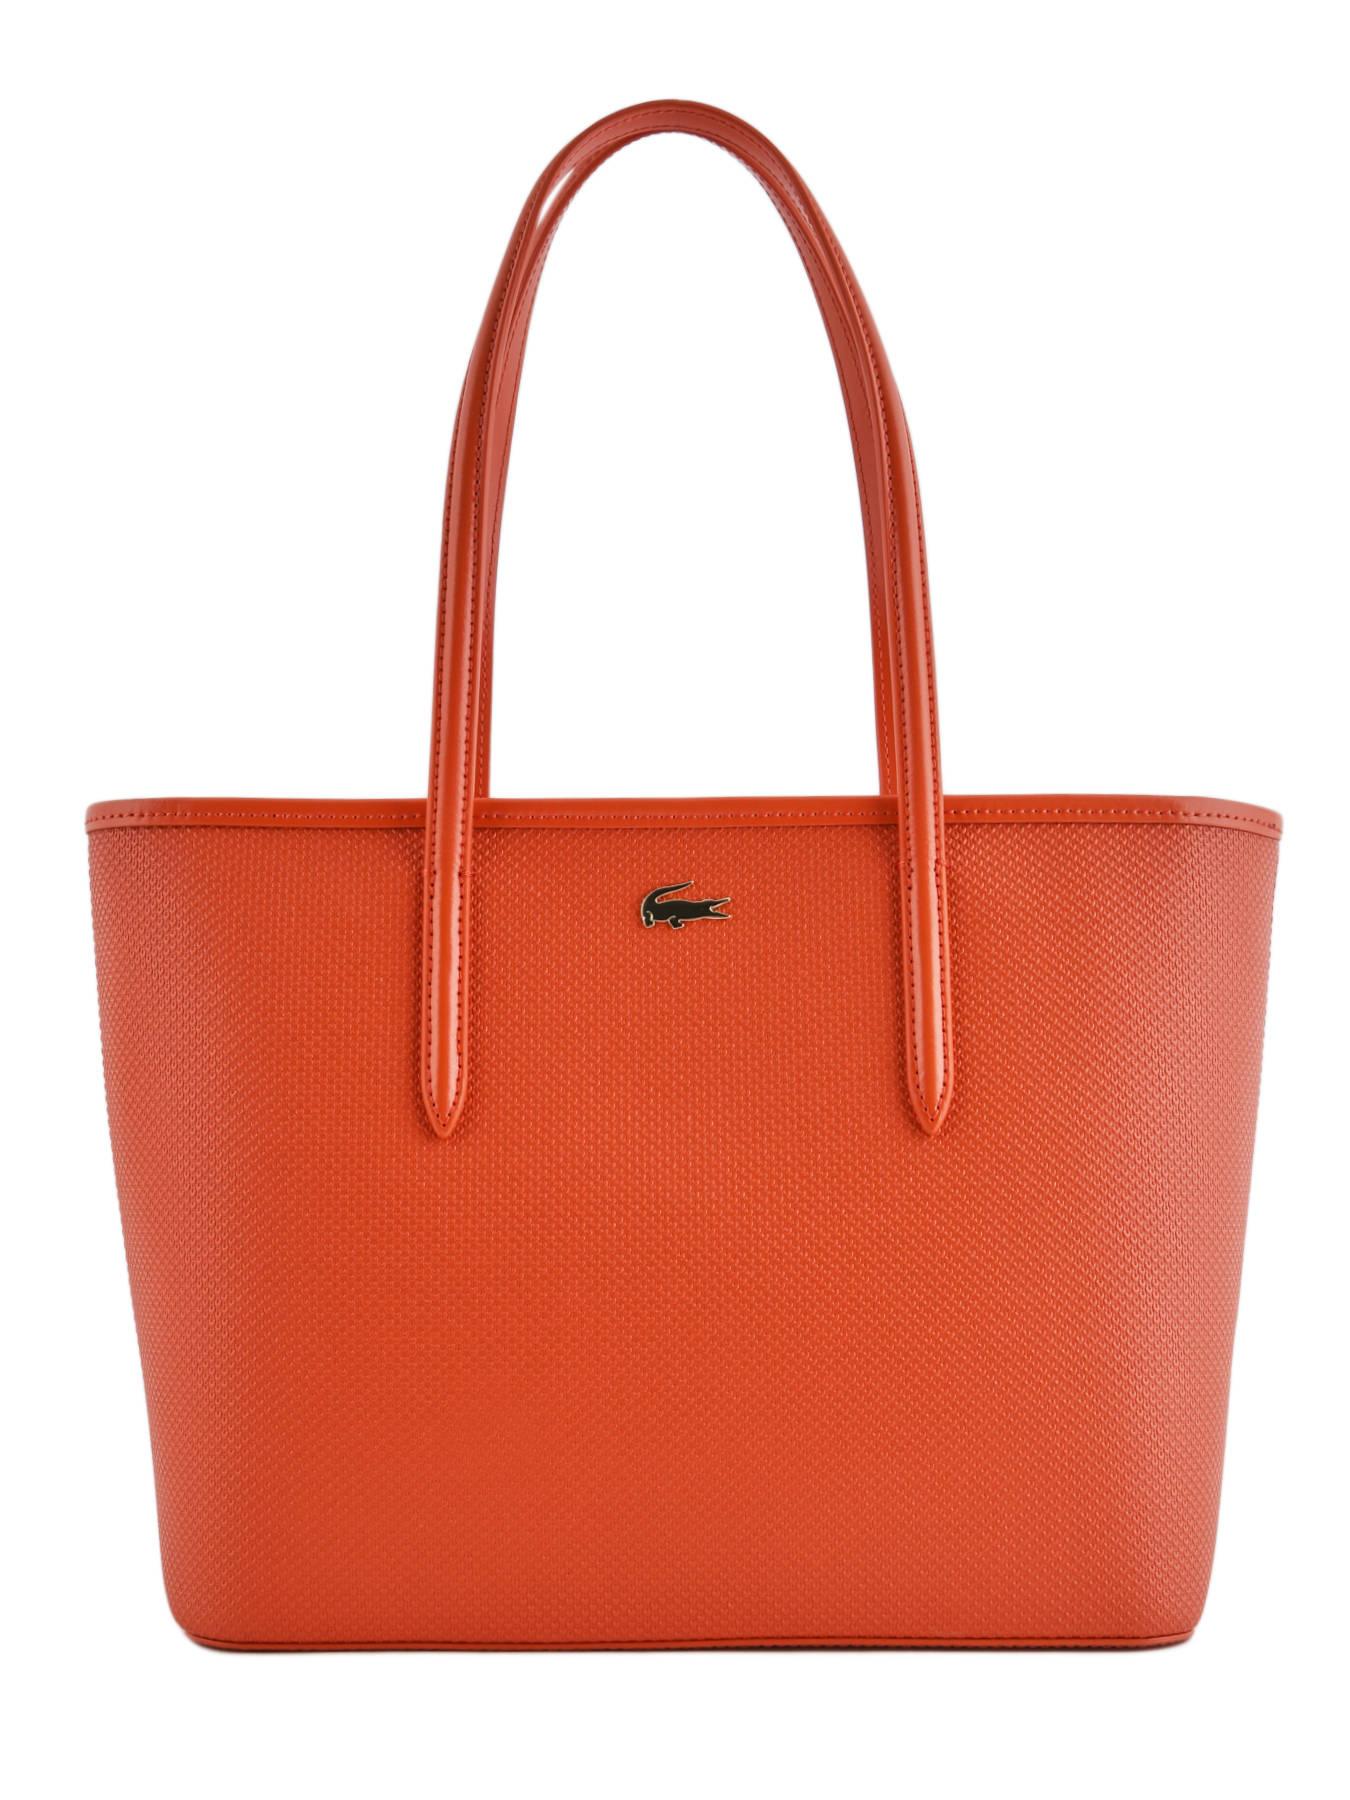 6cc402f6303 ... Shoulder Bag Chantaco Leather Lacoste Orange chantaco NF2116CE ...